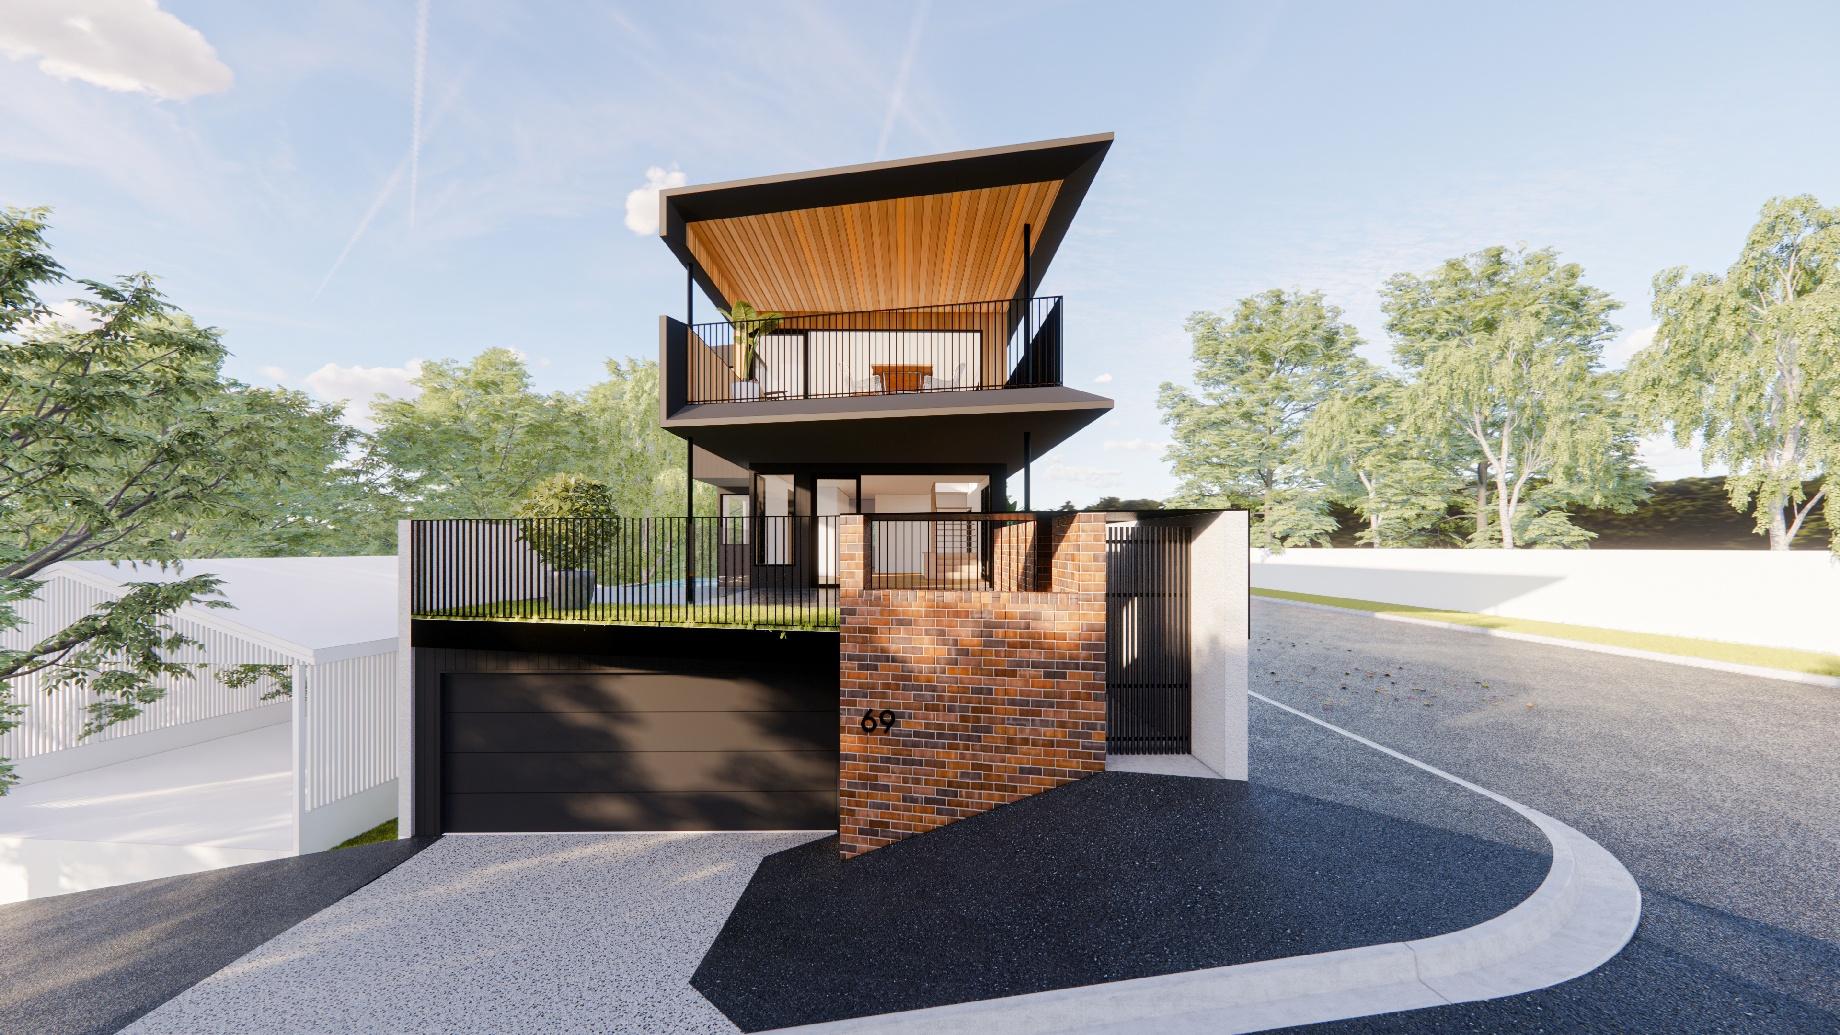 GRAYA™ custom home in Paddington Brisbane, featuring a Plungie Max 6m x 3m concrete pool